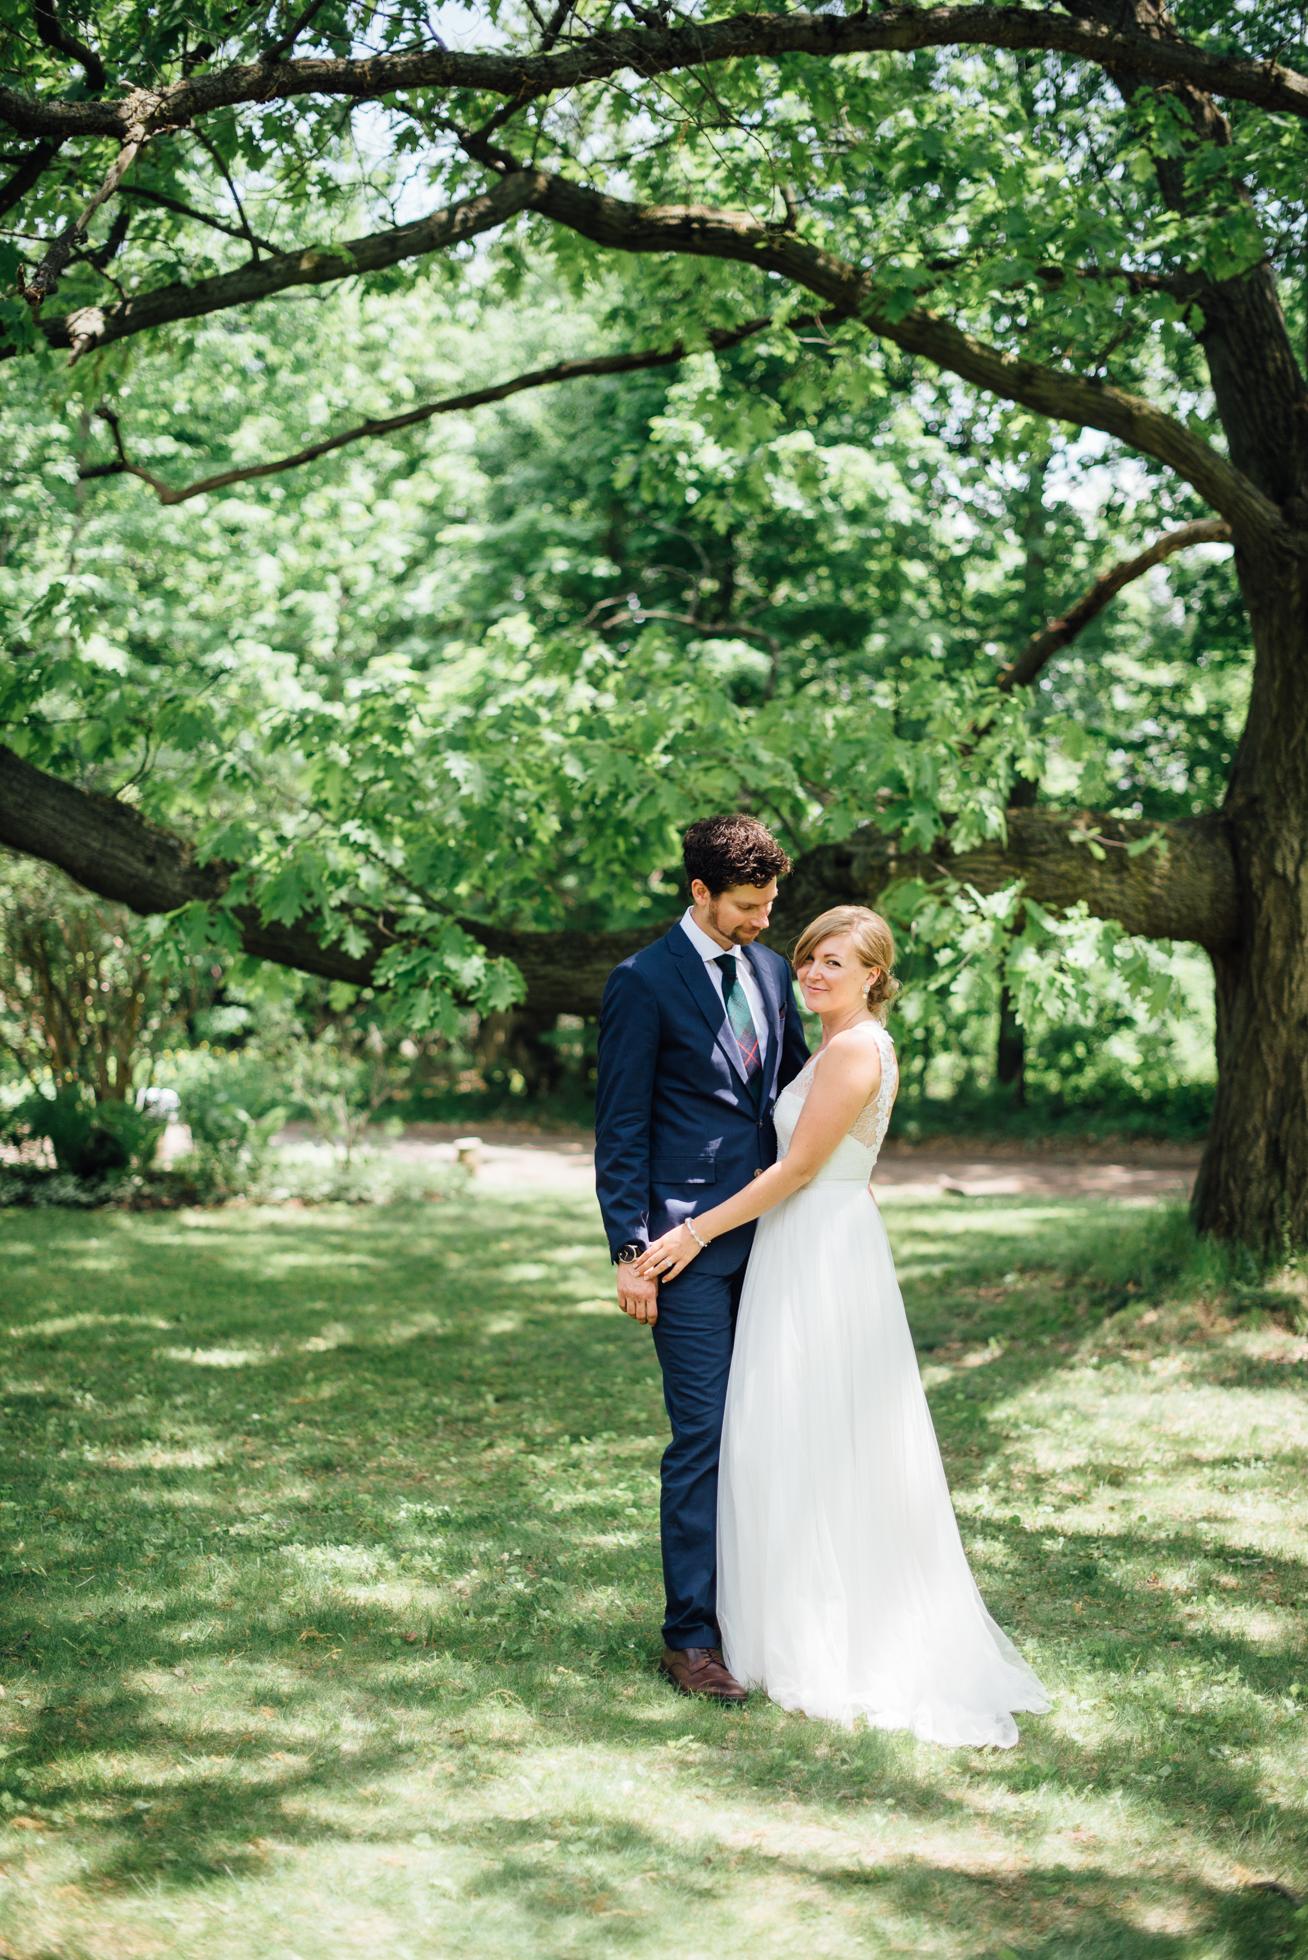 Outdoor-Caledon-Tralee-Wedding-Photography-32